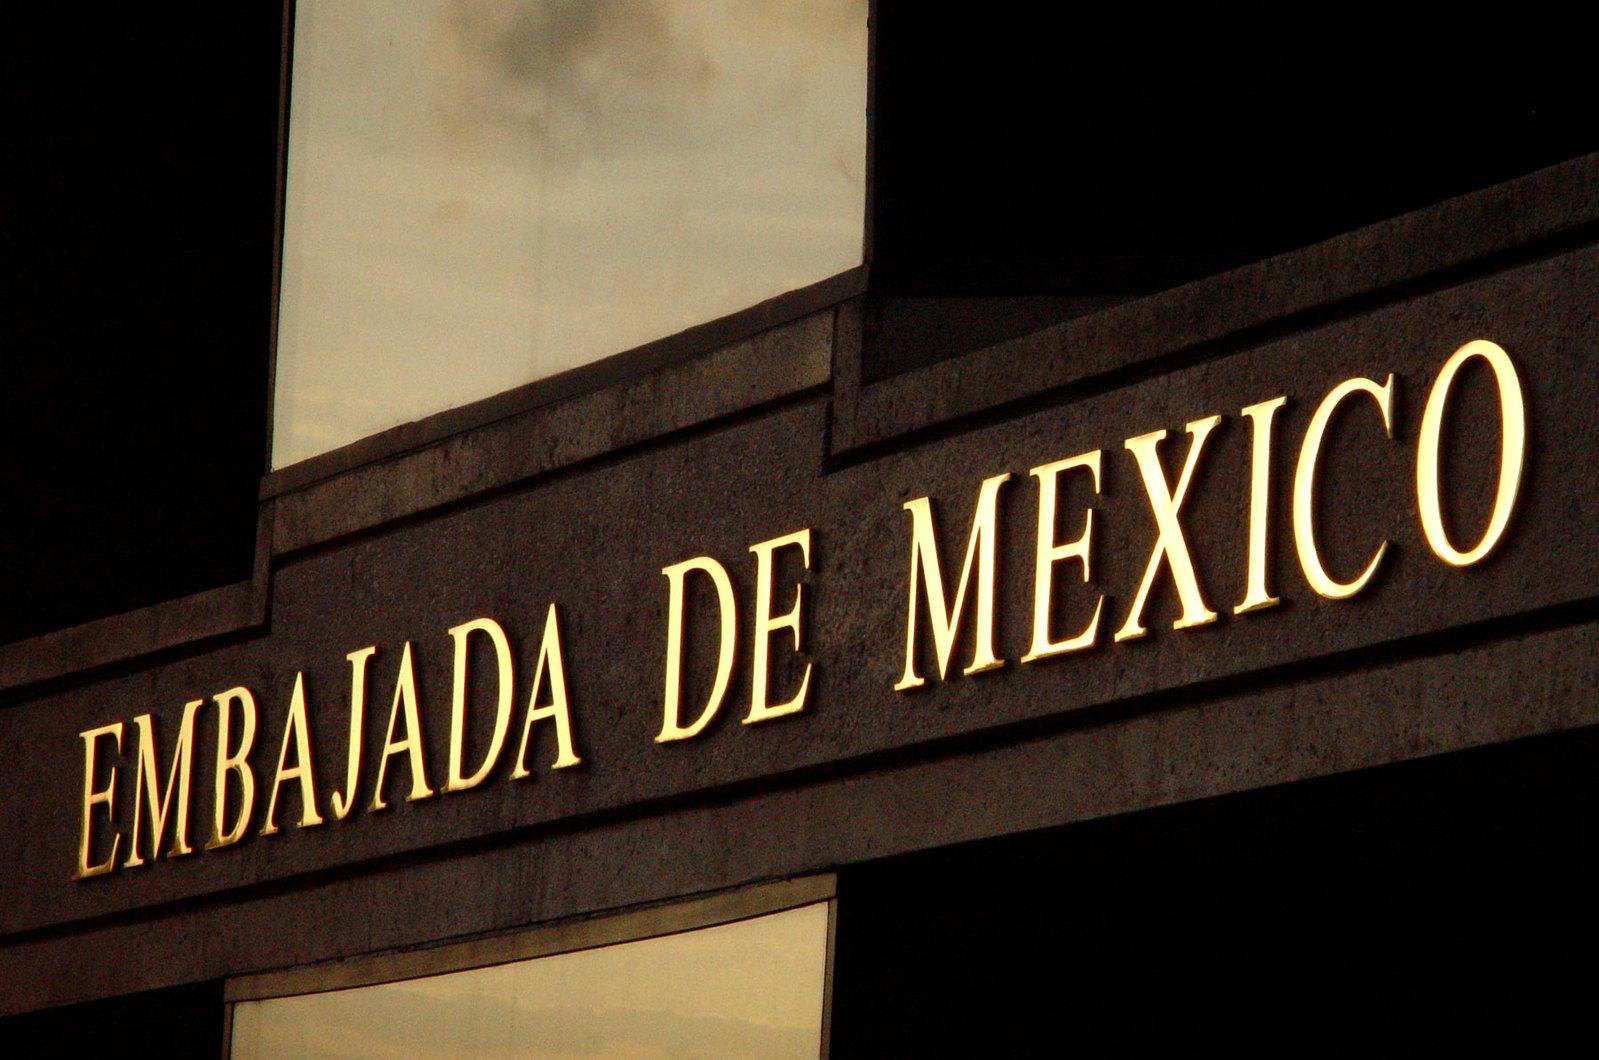 embajada de mexico sign